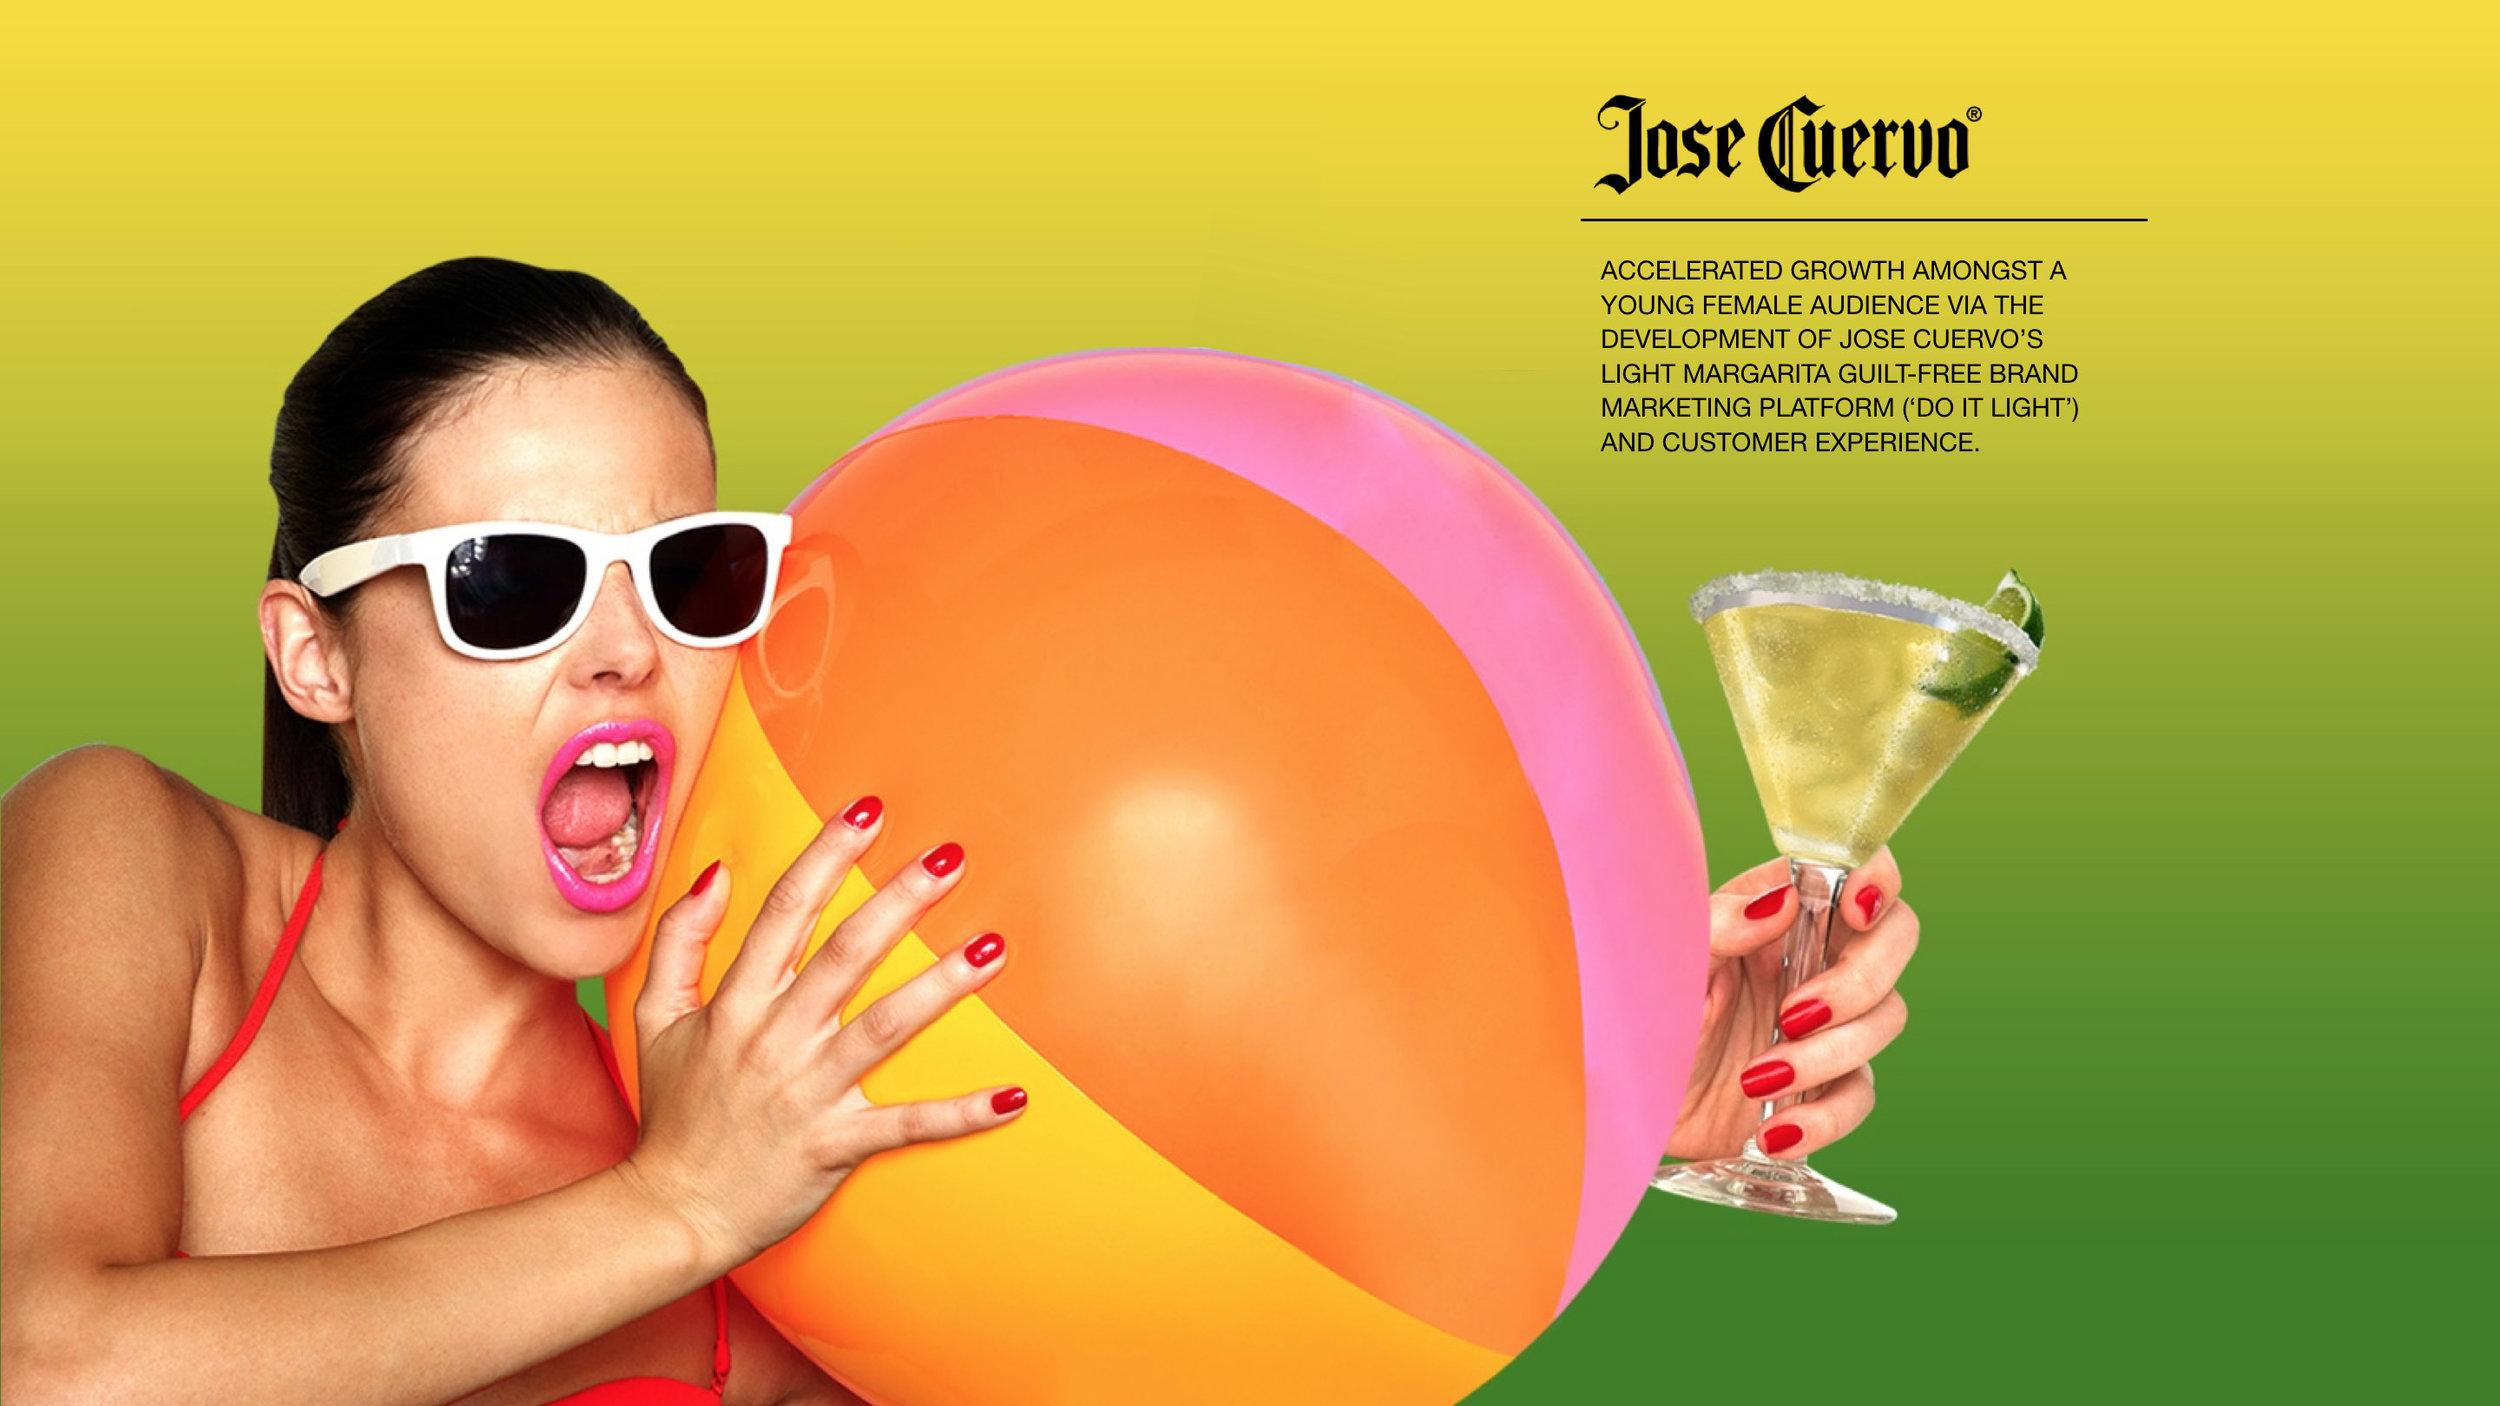 28.Jose_cuervo.jpg